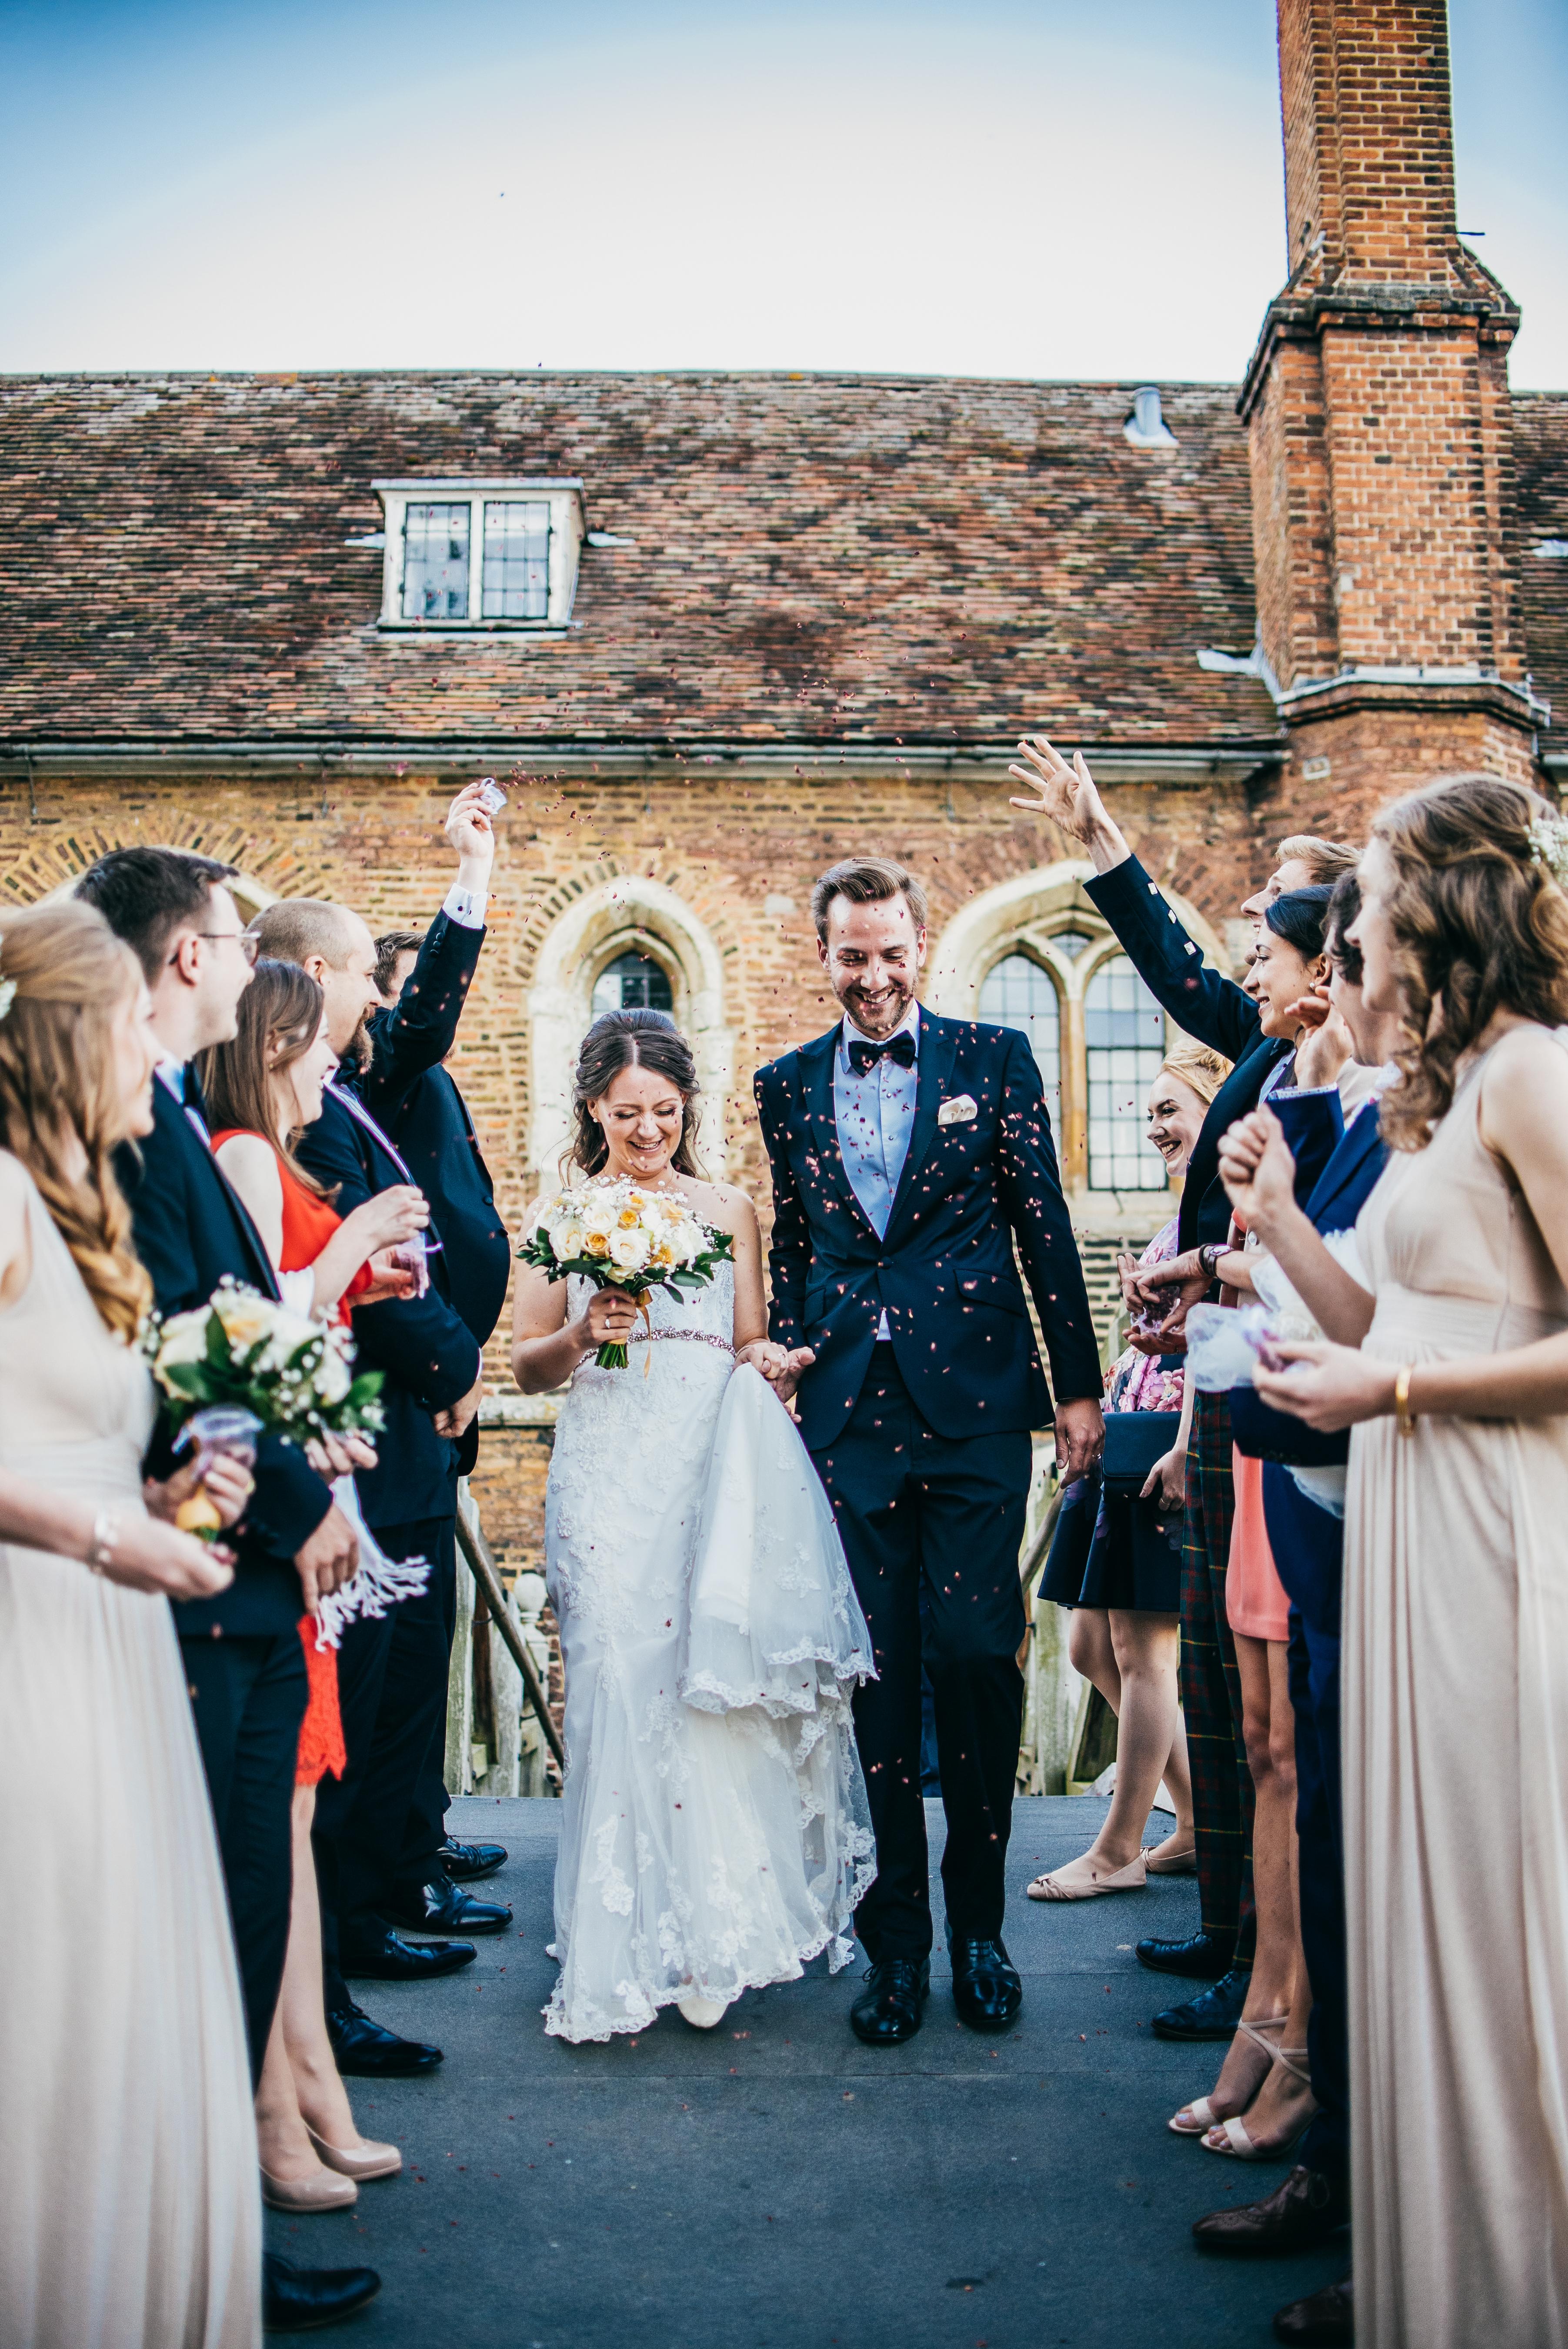 Capture House Weddings